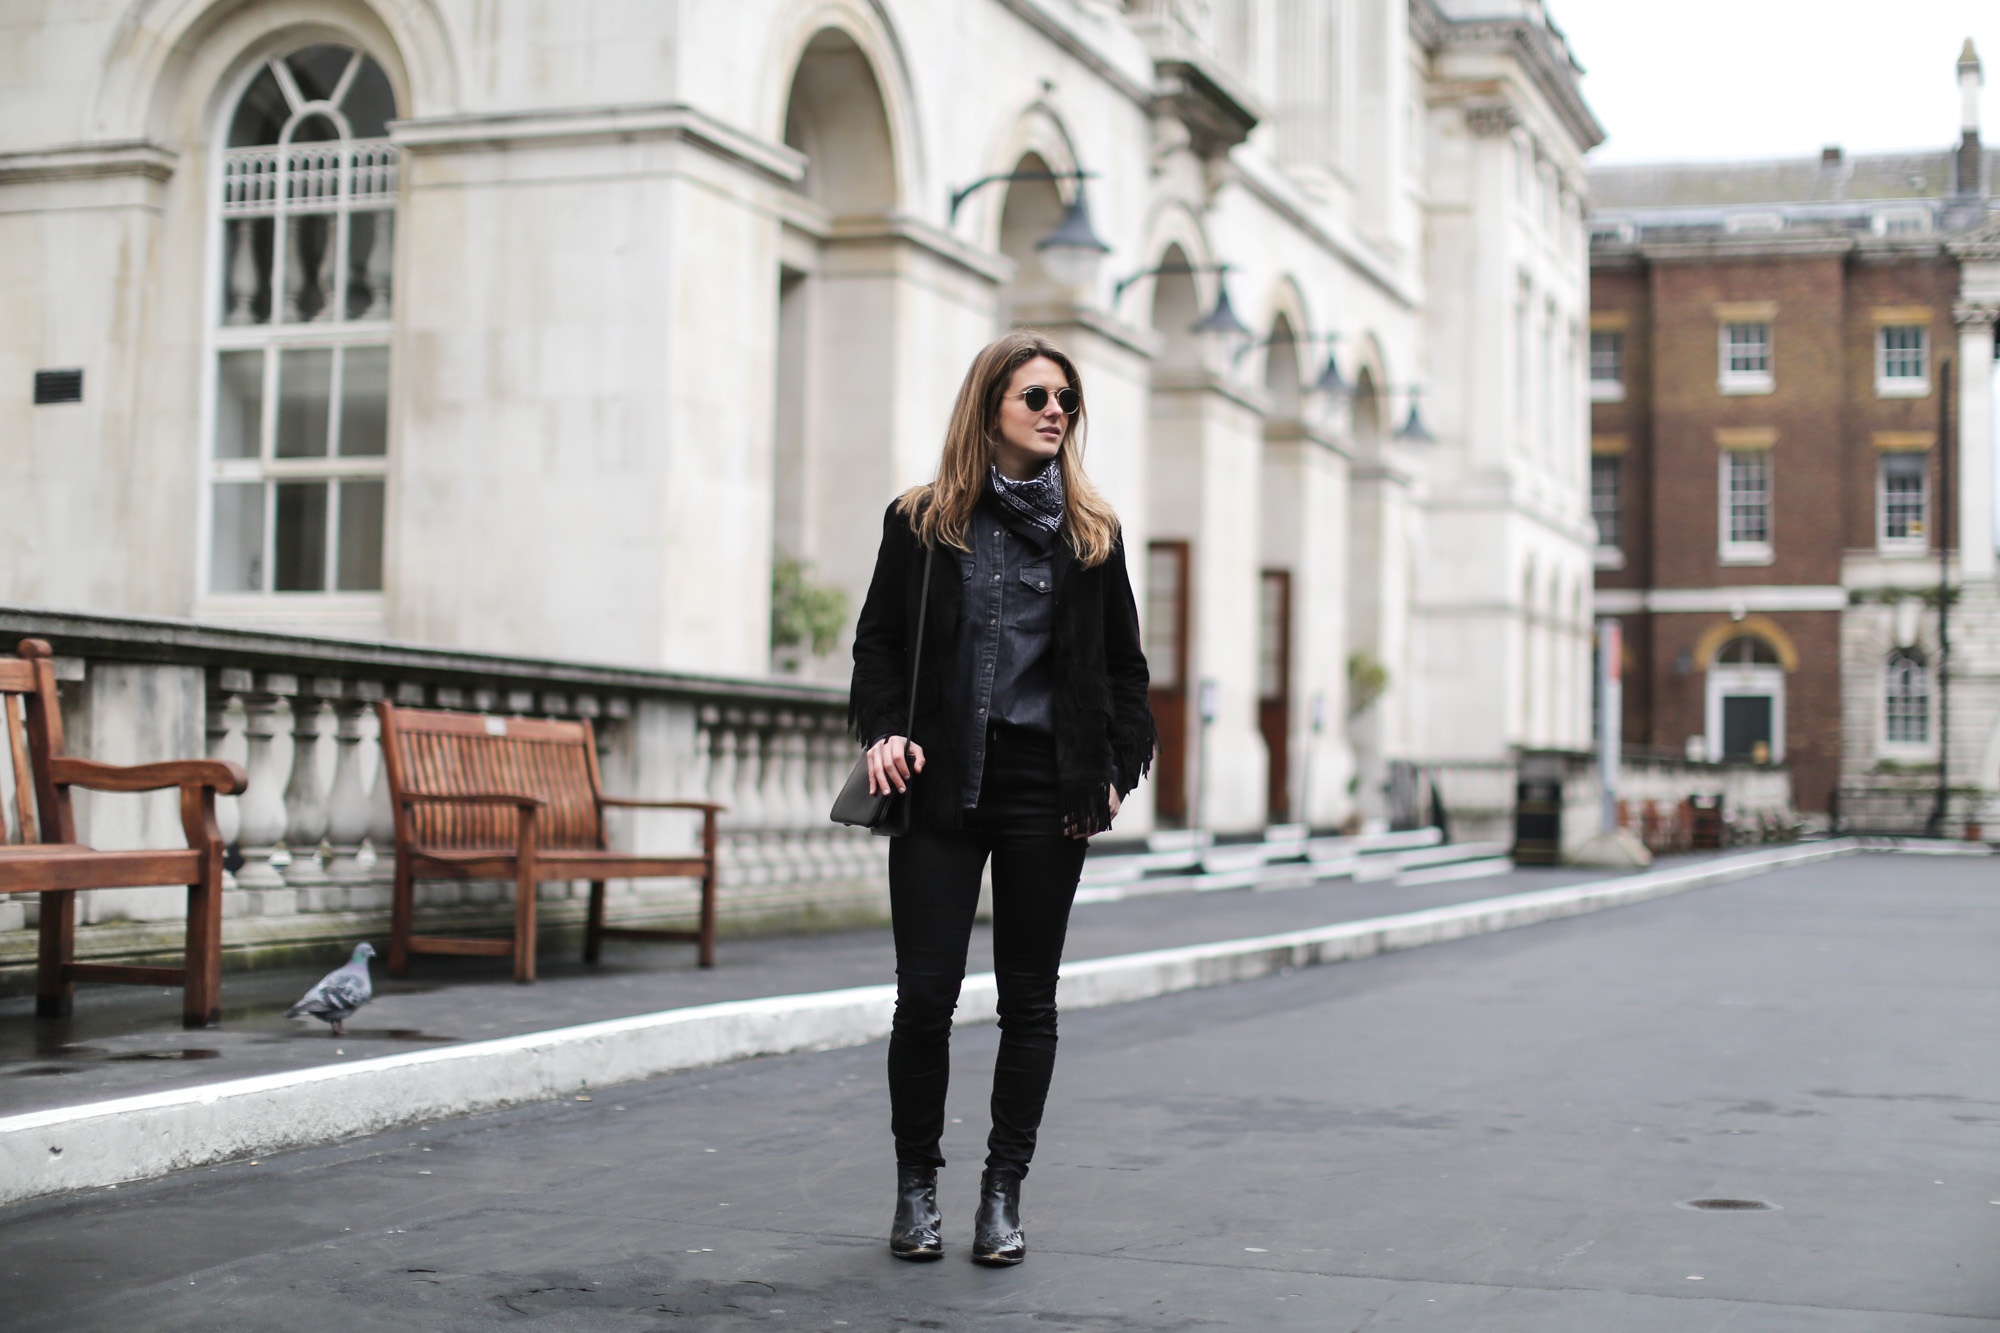 Clochet-streetstyle-lfw-london-fashion-week-maje-fringed-suede-jacket-cowboy-boots-3